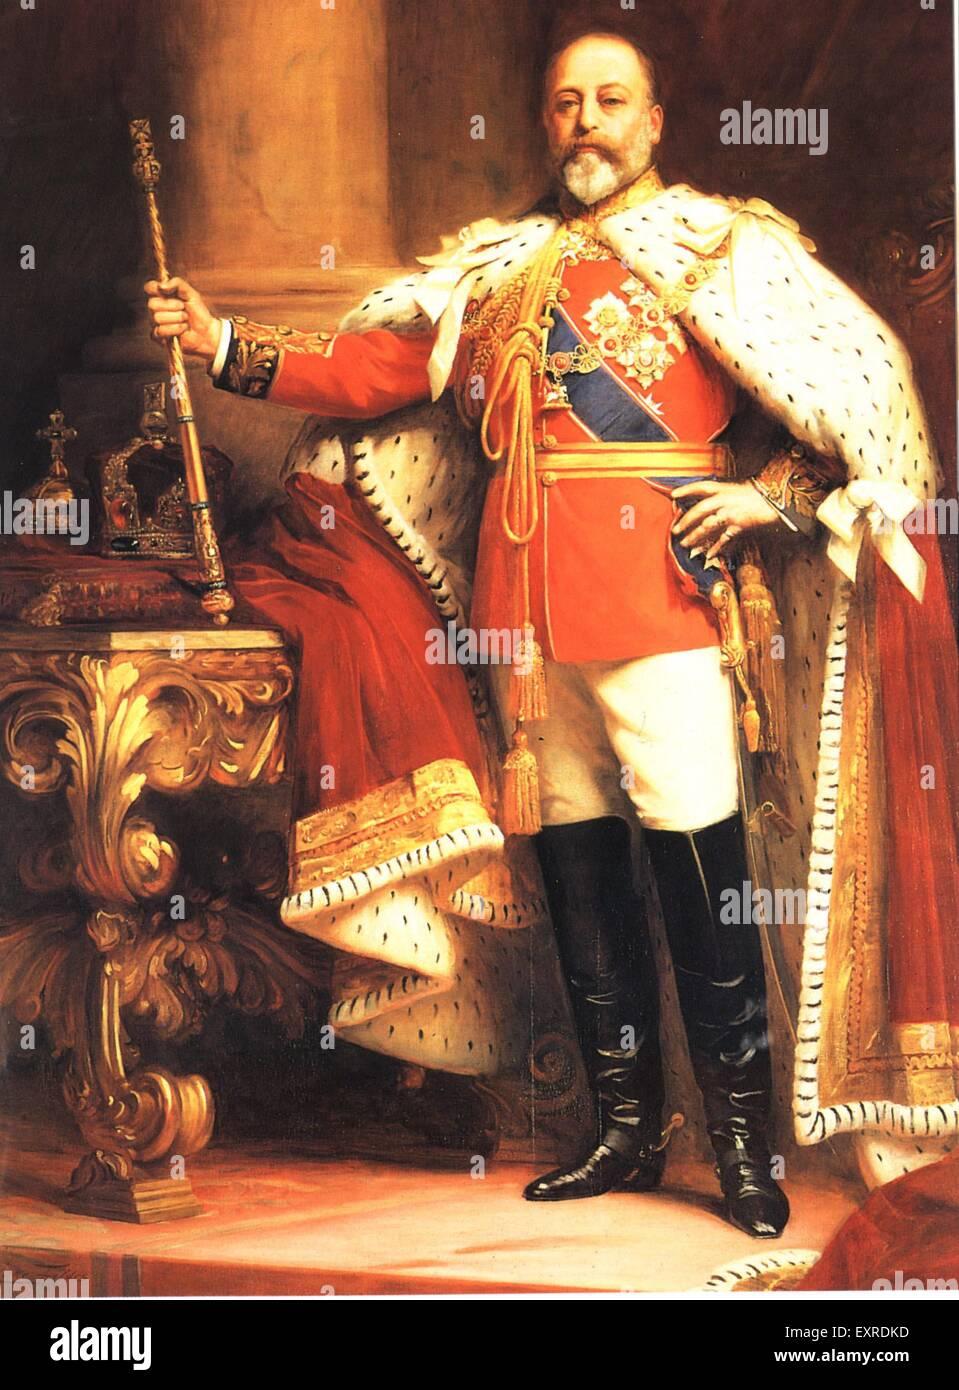 1900s UK King Edward VII Book Plate - Stock Image